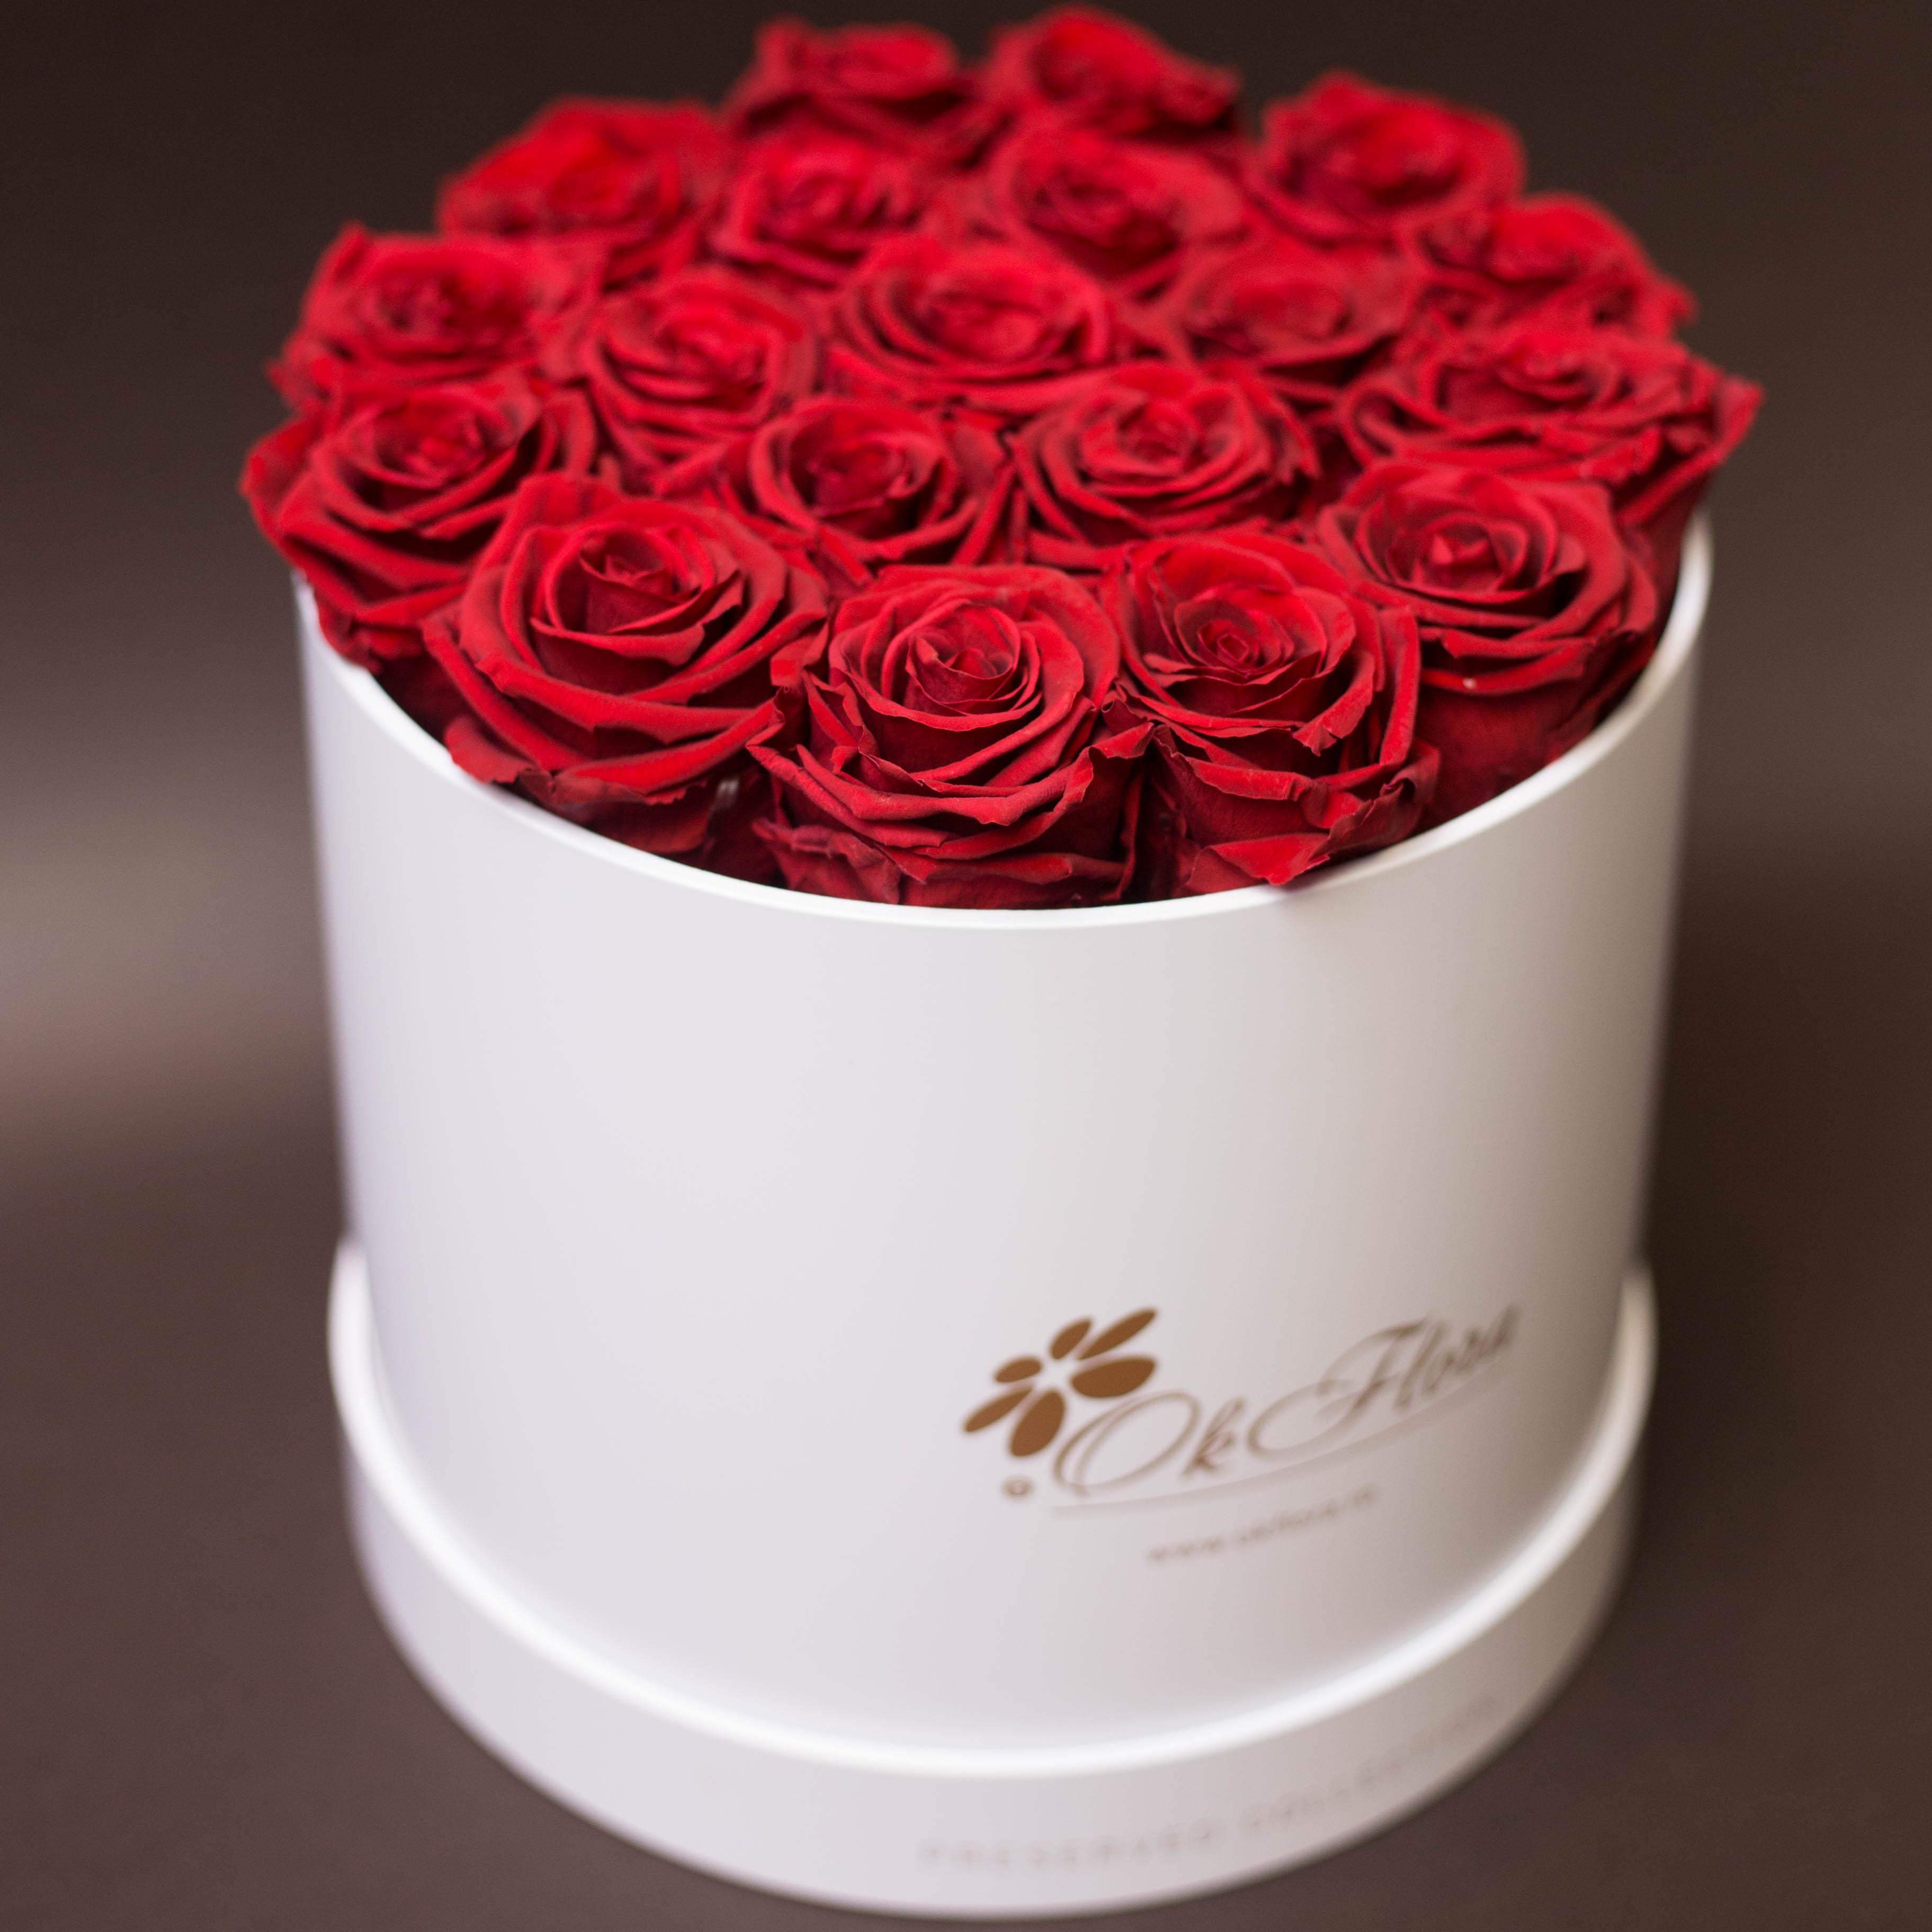 Buchete de flori: trandafiri, lalele, crizanteme  OkFlora ro